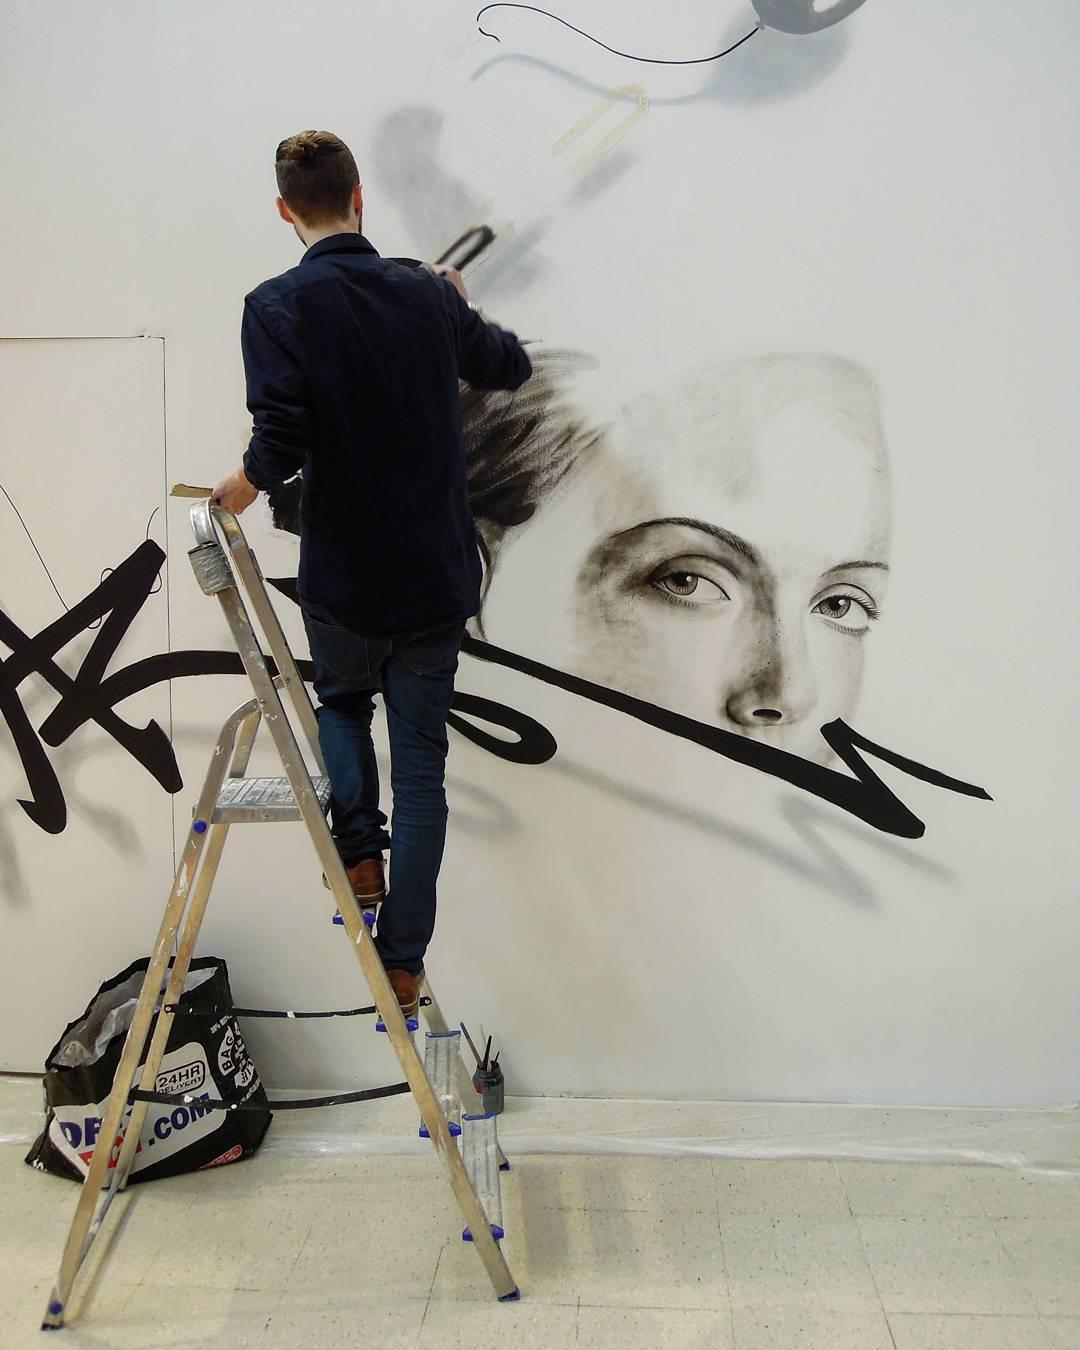 noir artist, bercy 2 , paris, street art, muraliste, trompe l'oeil, painting, peinture, art, wildstreet